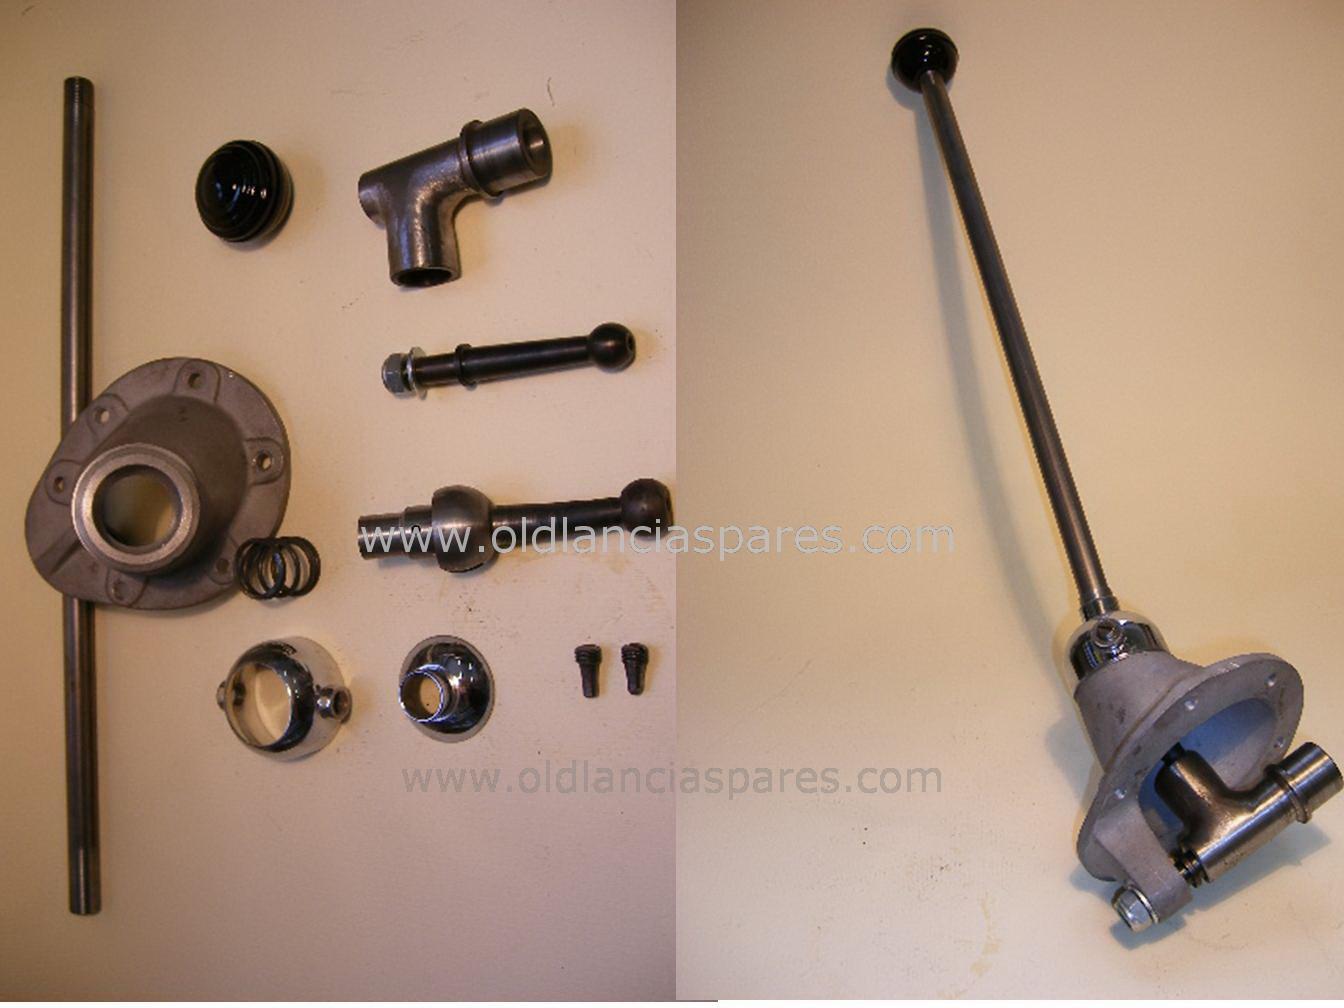 CAV357 - Nardi set for gear modification on the floor